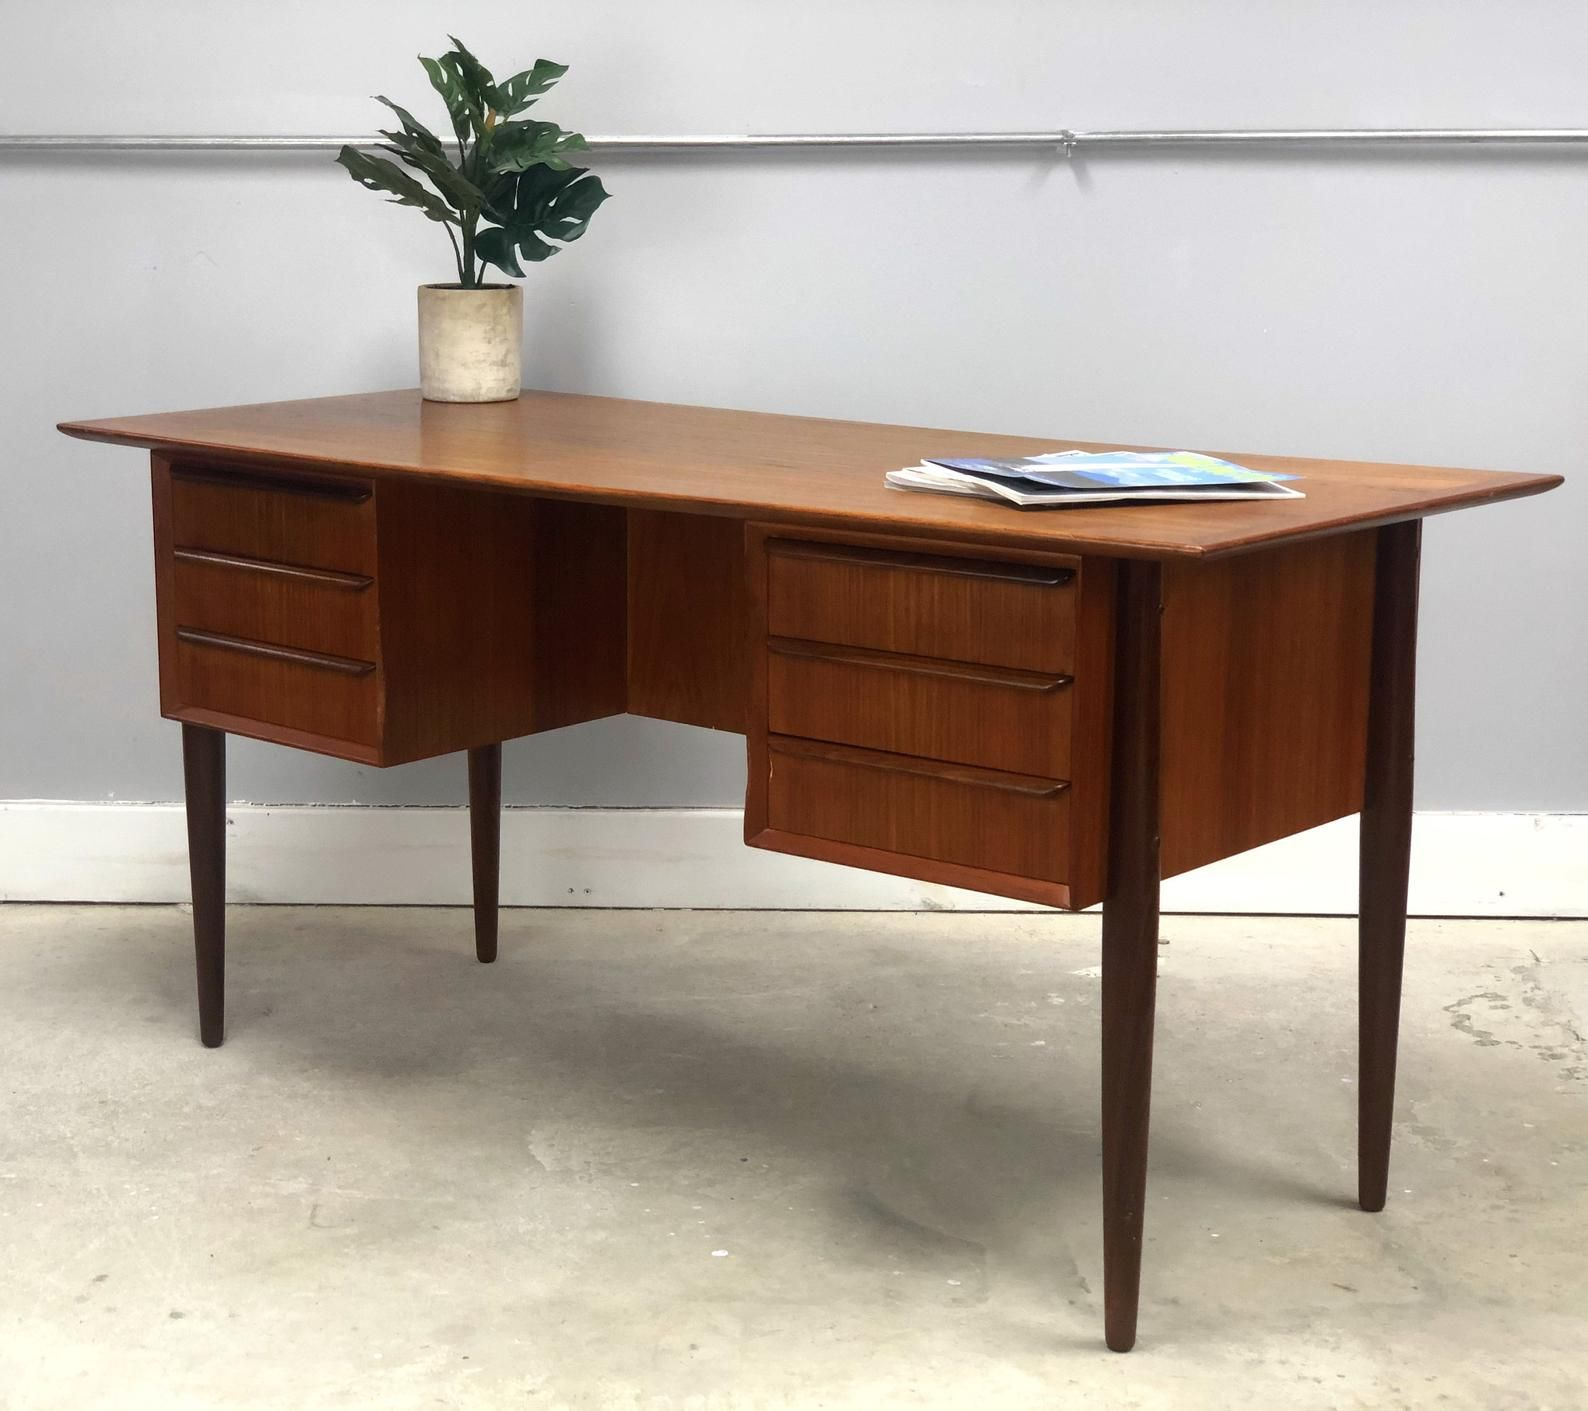 Mid Century Danish Modern Teak Desk With Bookcase Etsy In 2020 Mid Century Modern Office Desk Modern Office Furniture Desk Mid Century Modern Desk